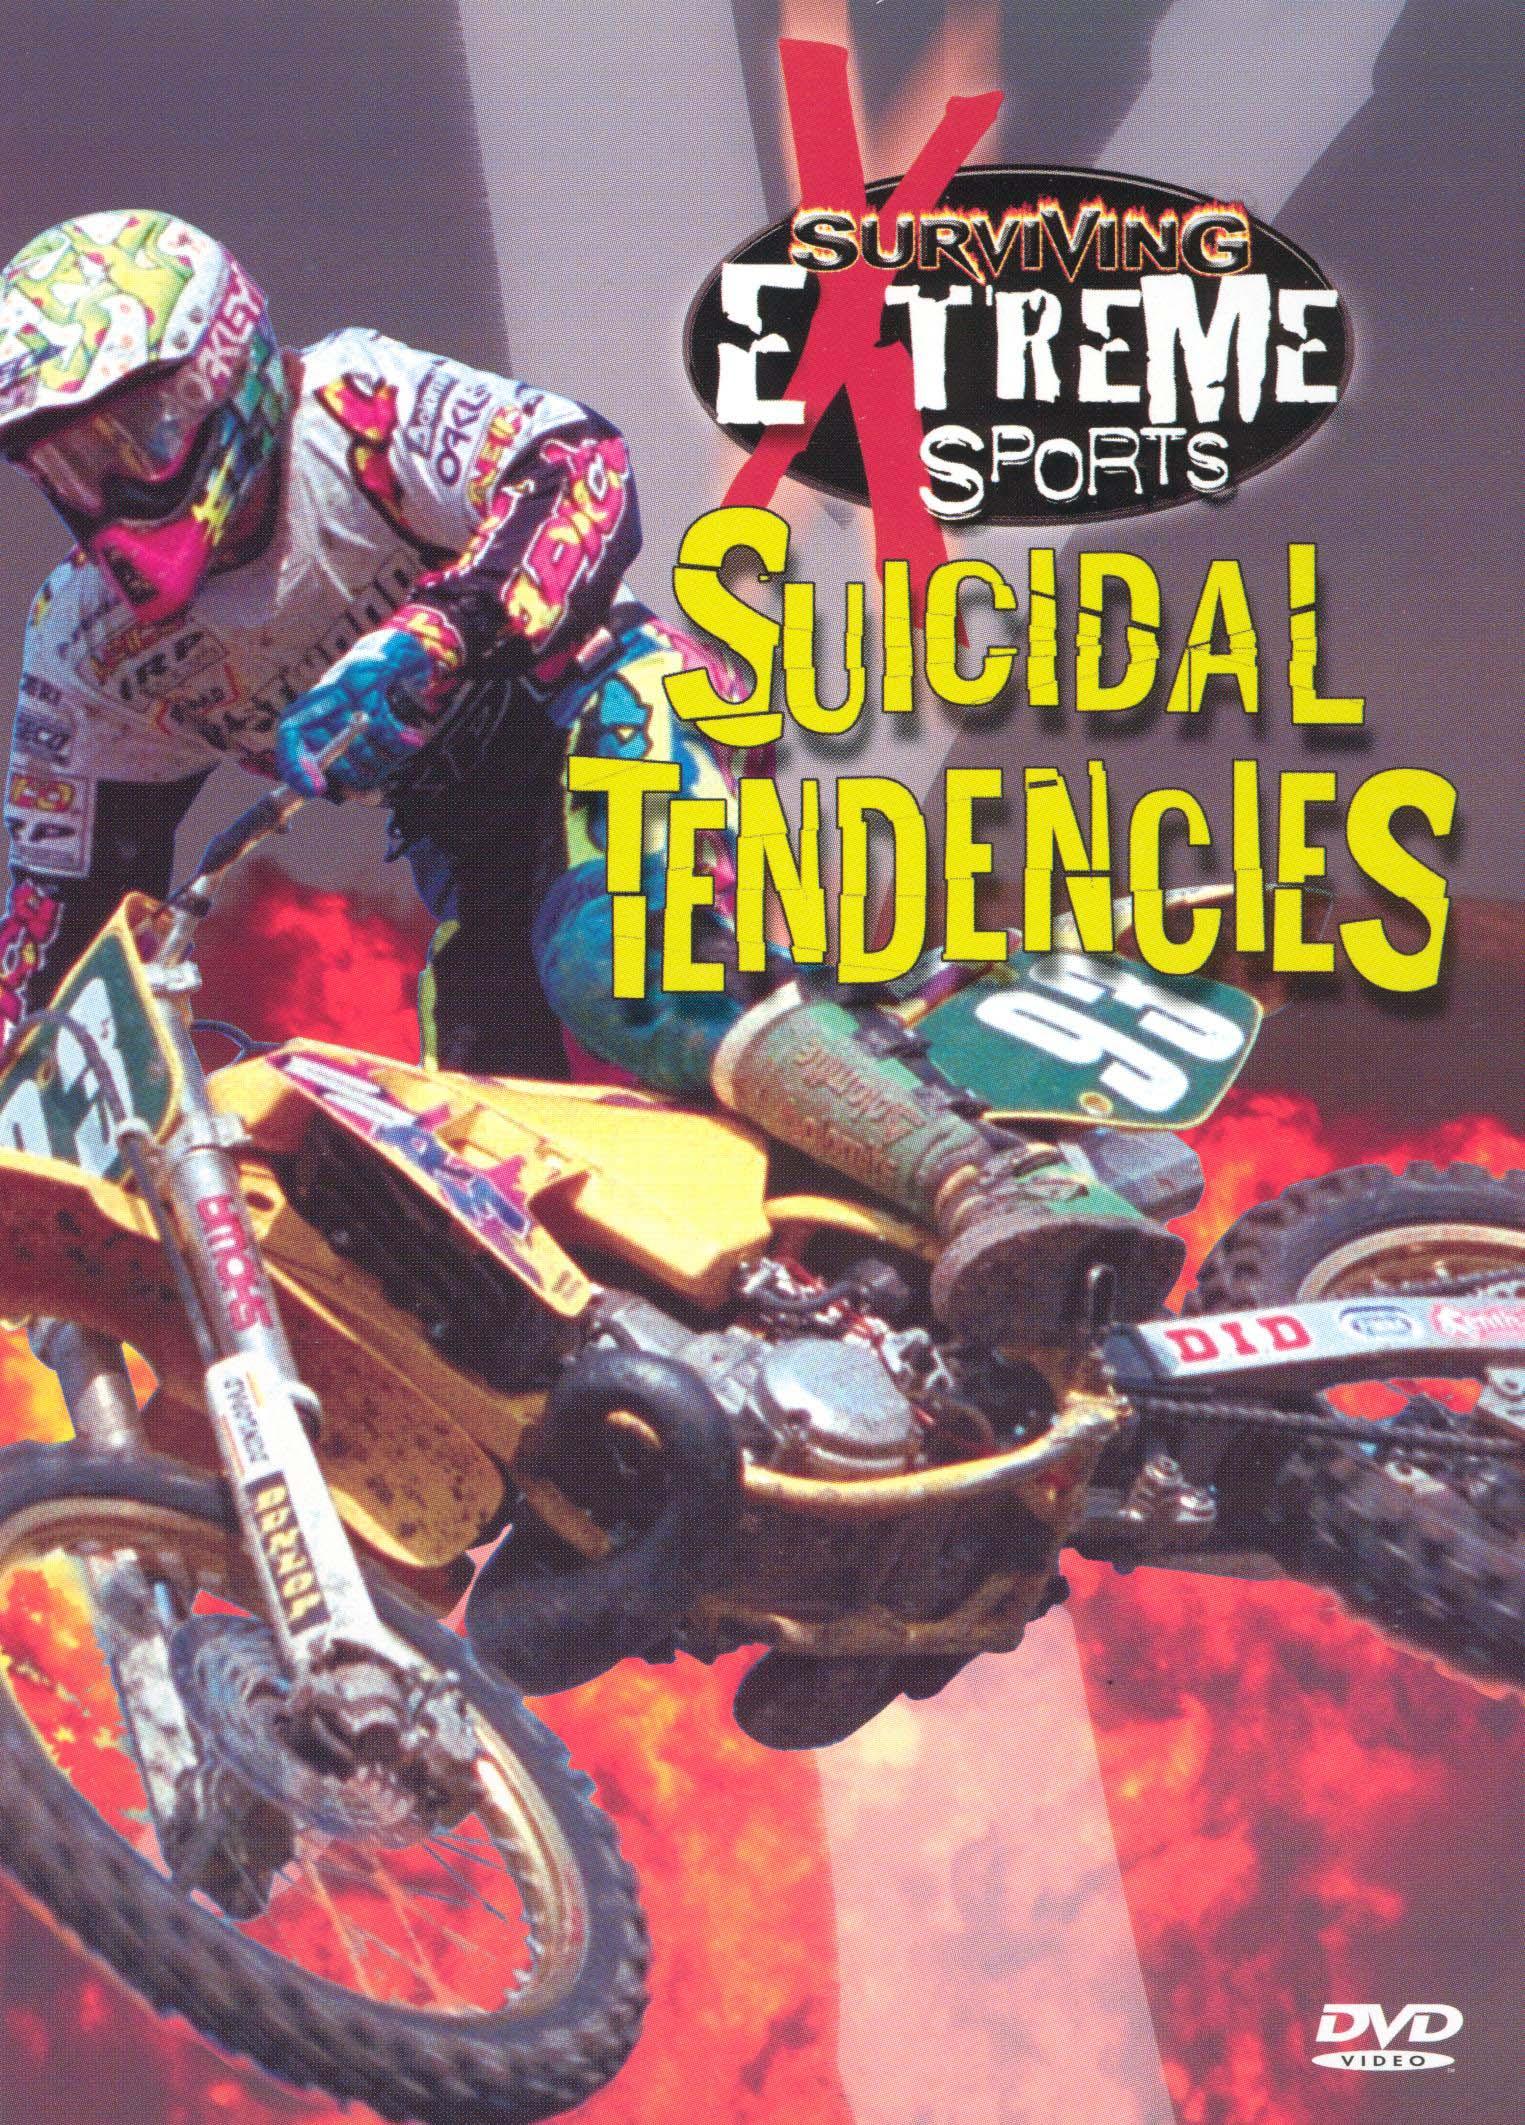 Surviving Extreme Sports: Suicidal Tendencies